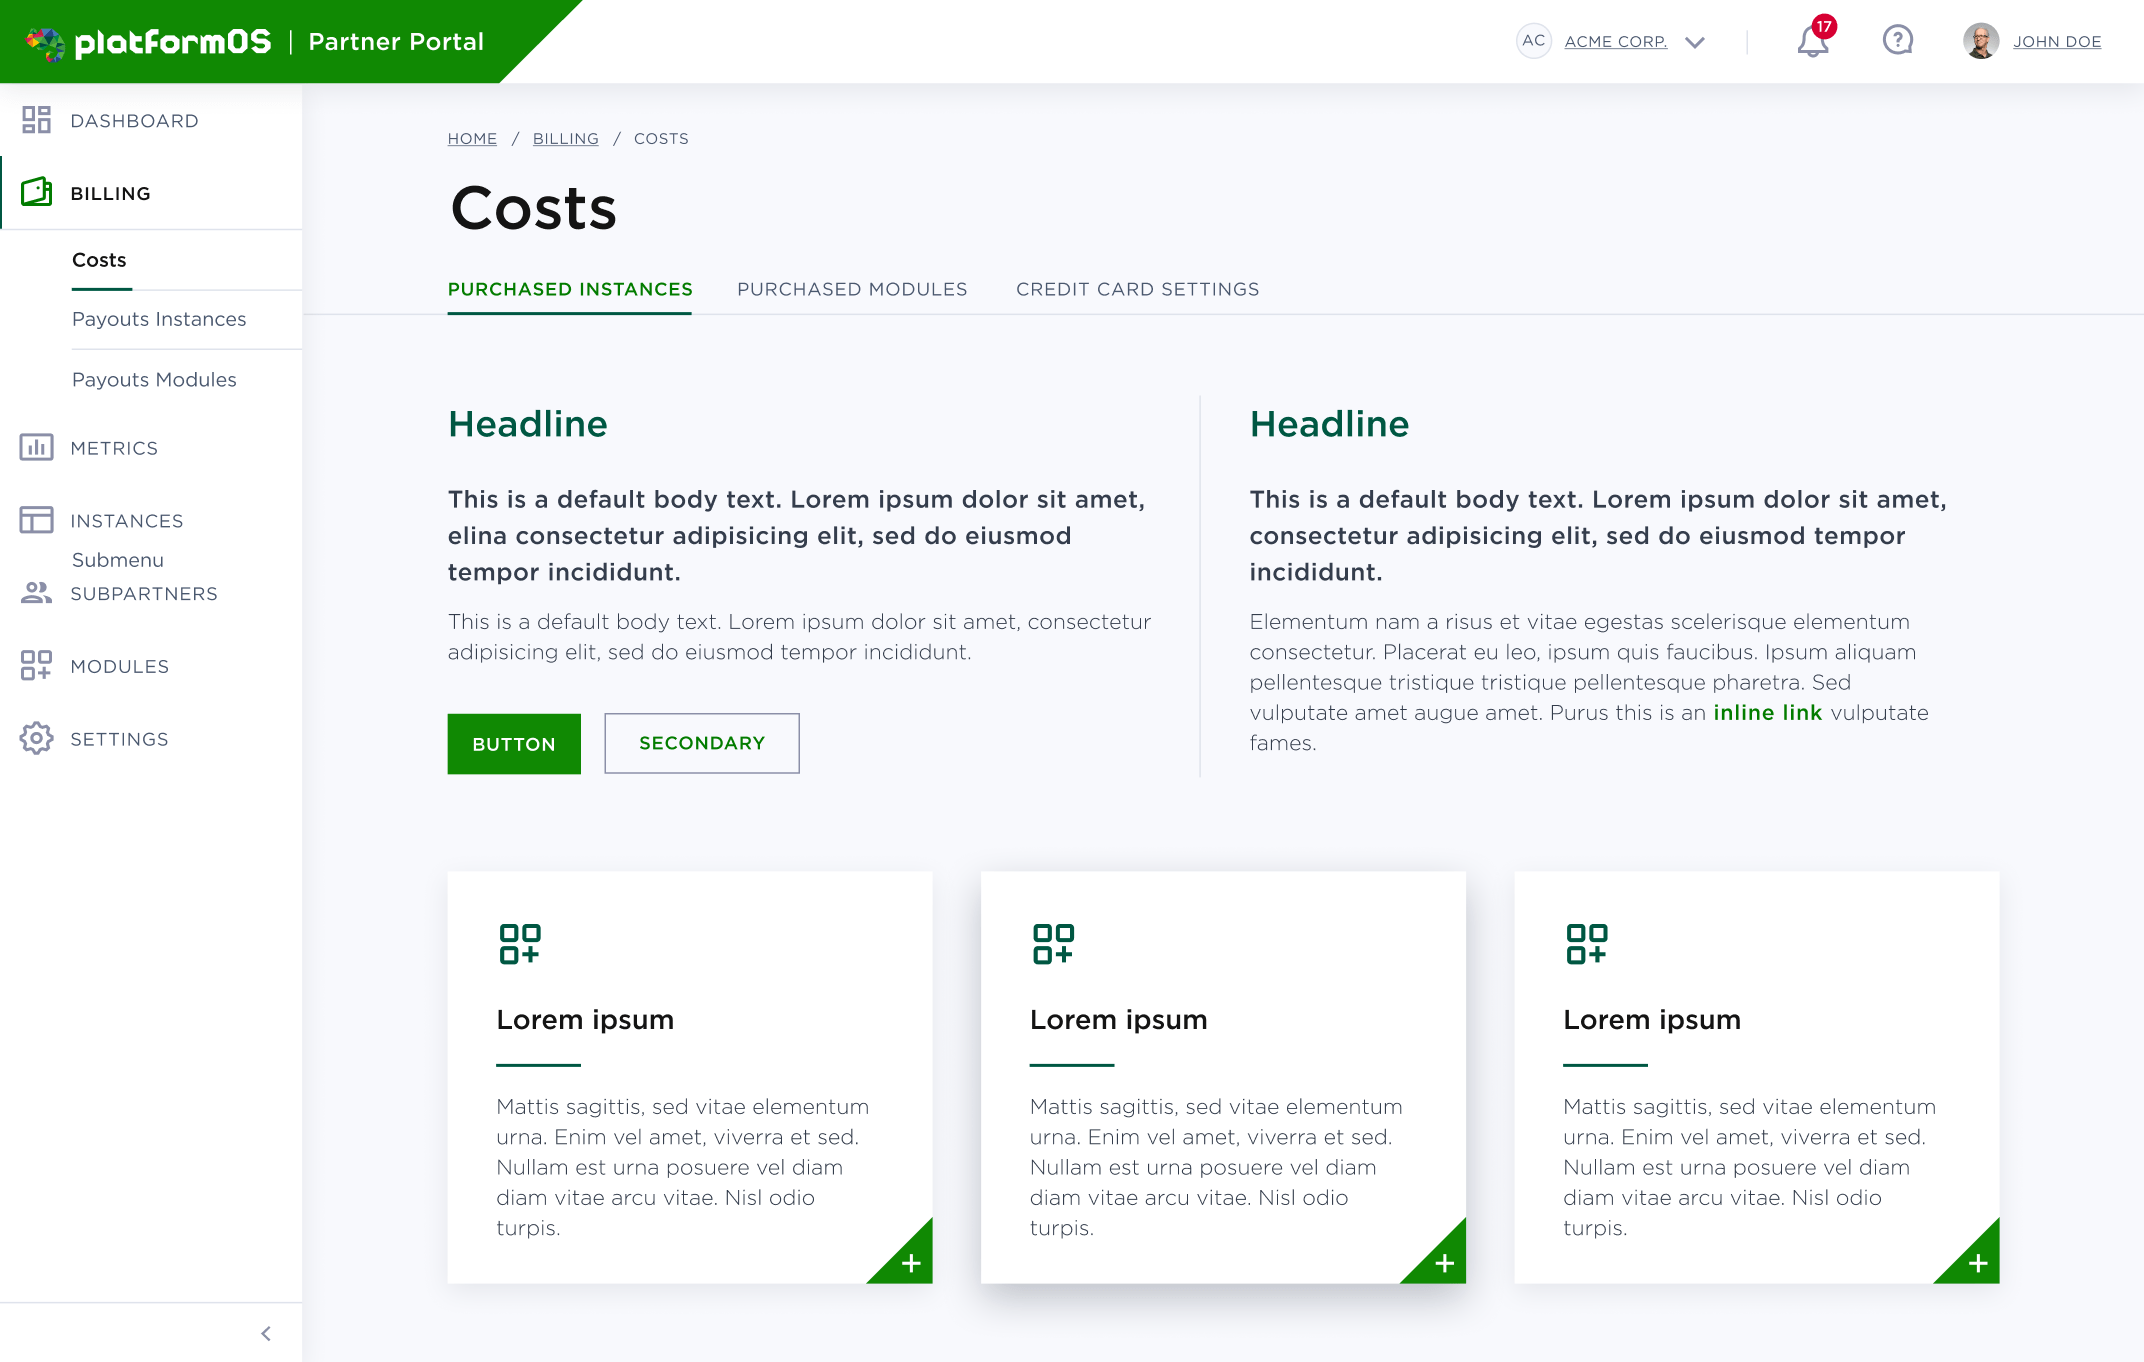 Selected designed style for the platformOS Partner Portal